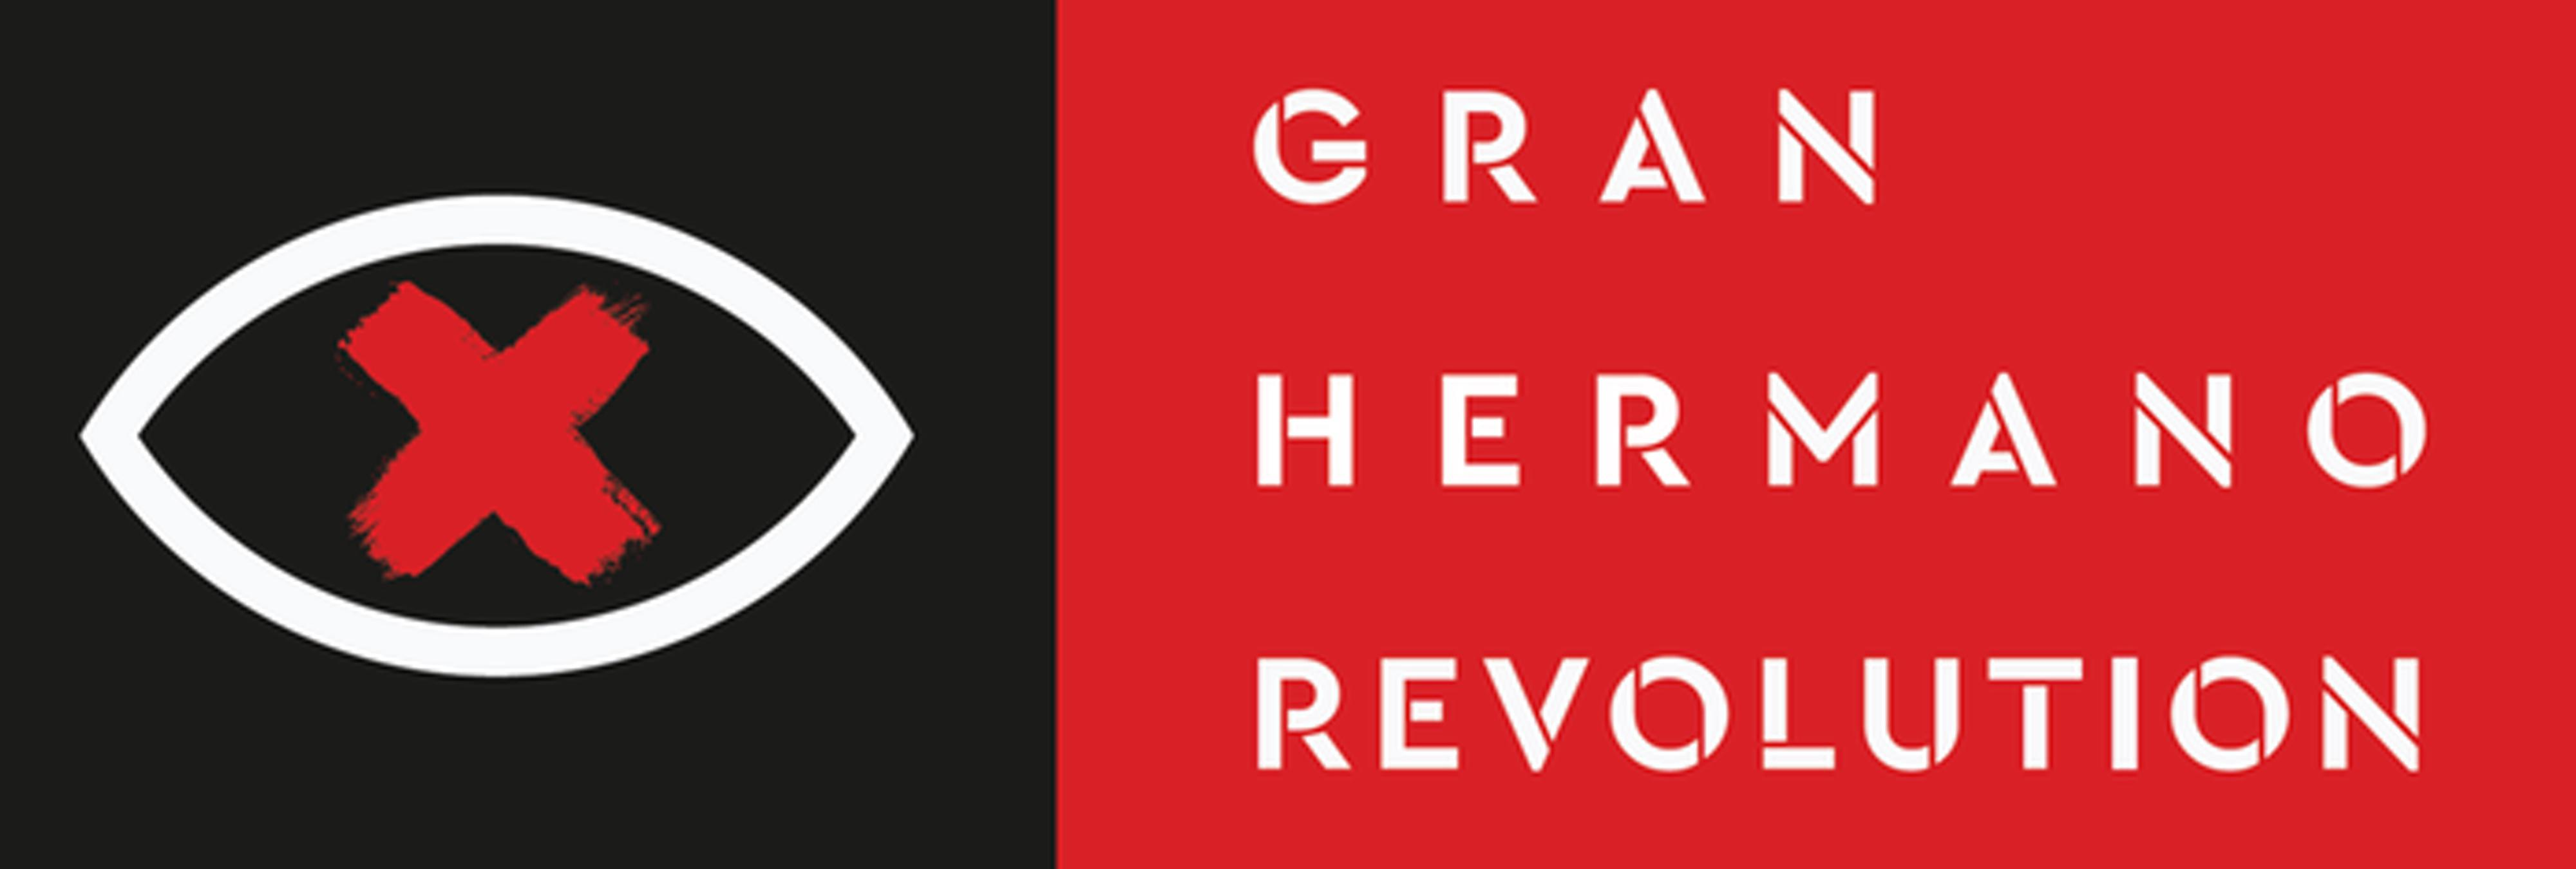 "Concursante de 'GH Revolution' denuncia al reality por fraude: ""Están todos contratados"""